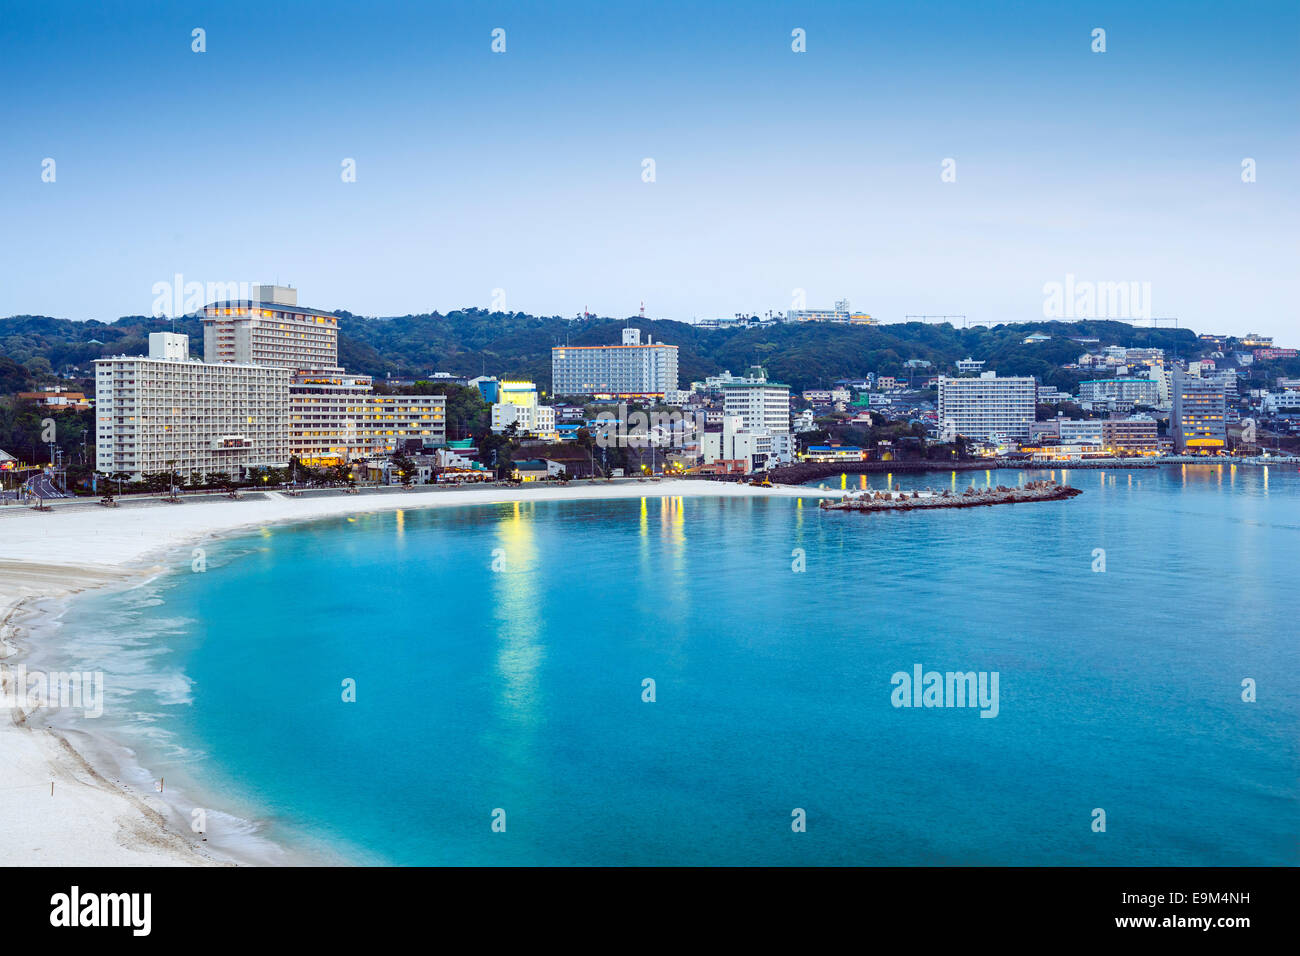 Japanese Spa Stock Photos & Japanese Spa Stock Images - Alamy